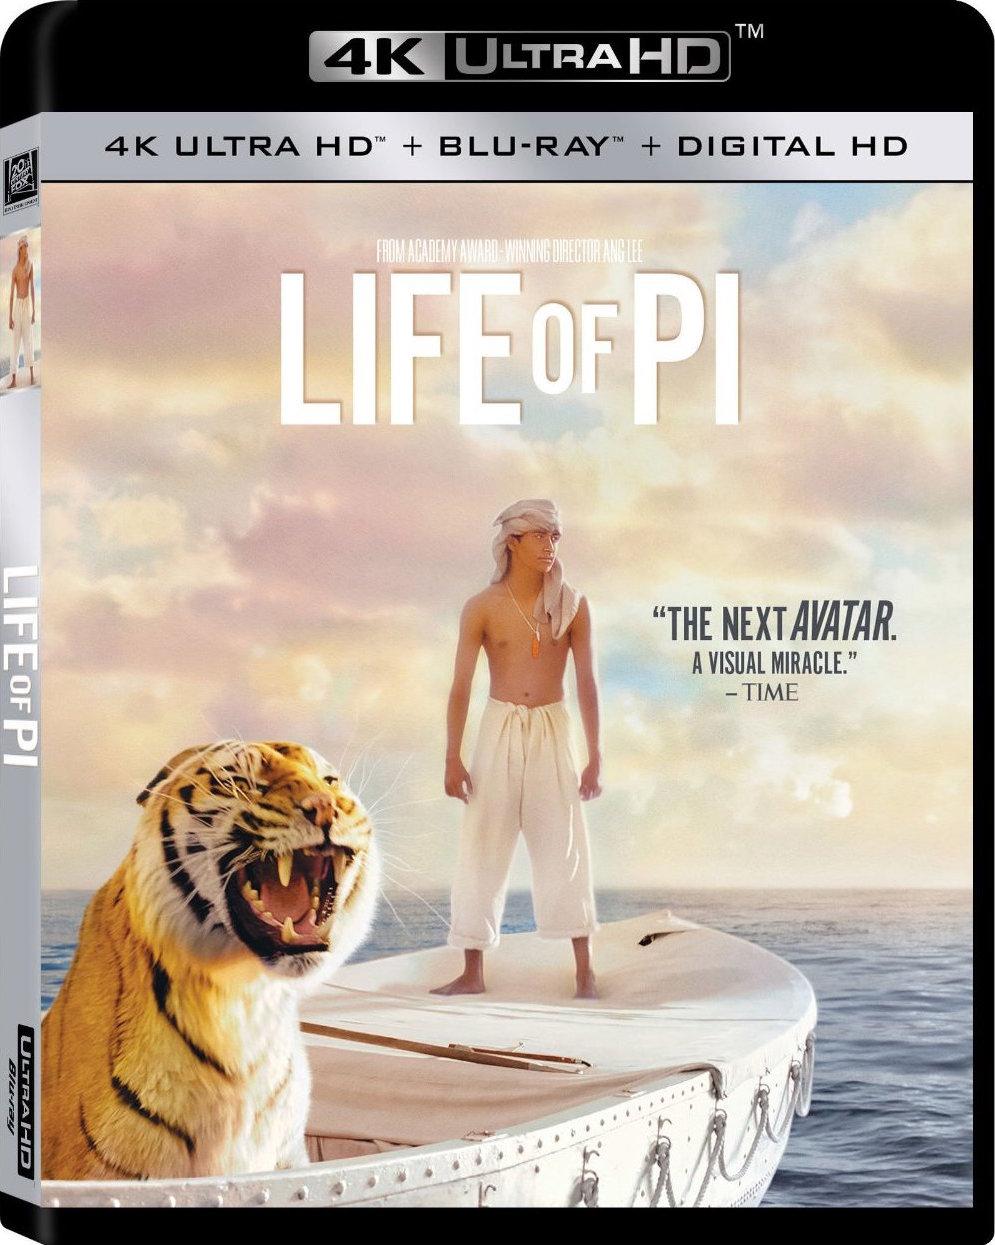 Life of Pi (2012) 4K Ultra HD Blu-ray